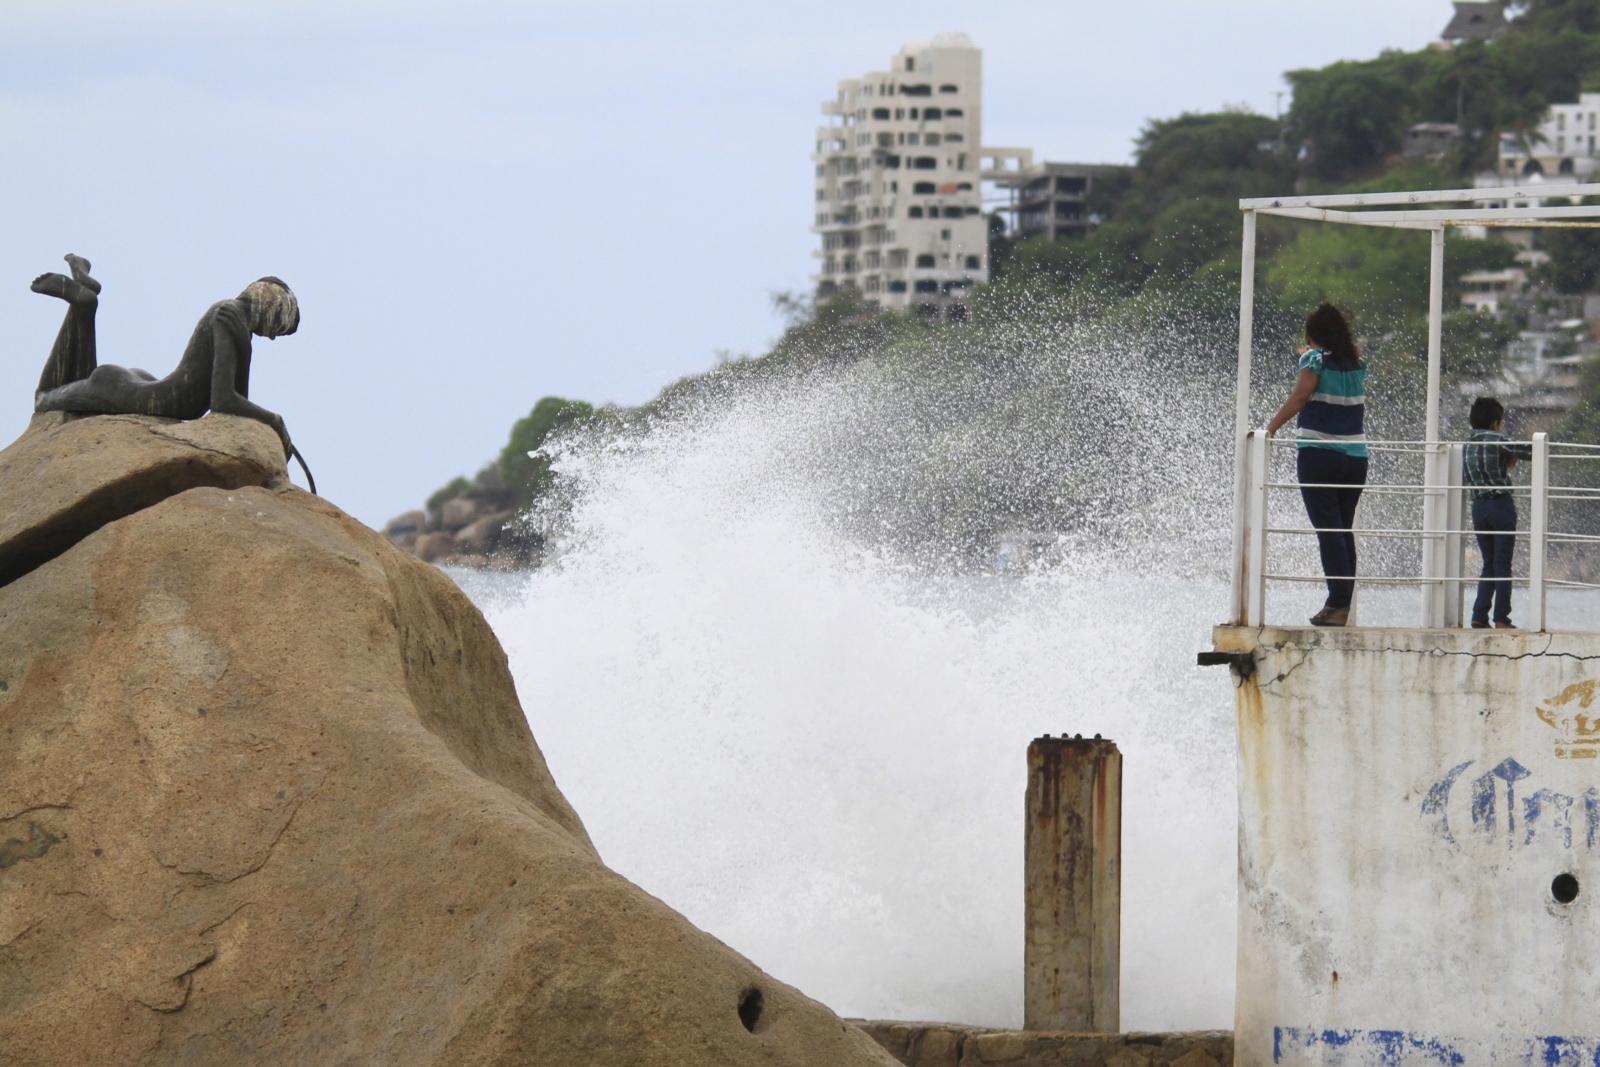 hurricane Carlos approaches Acapulco